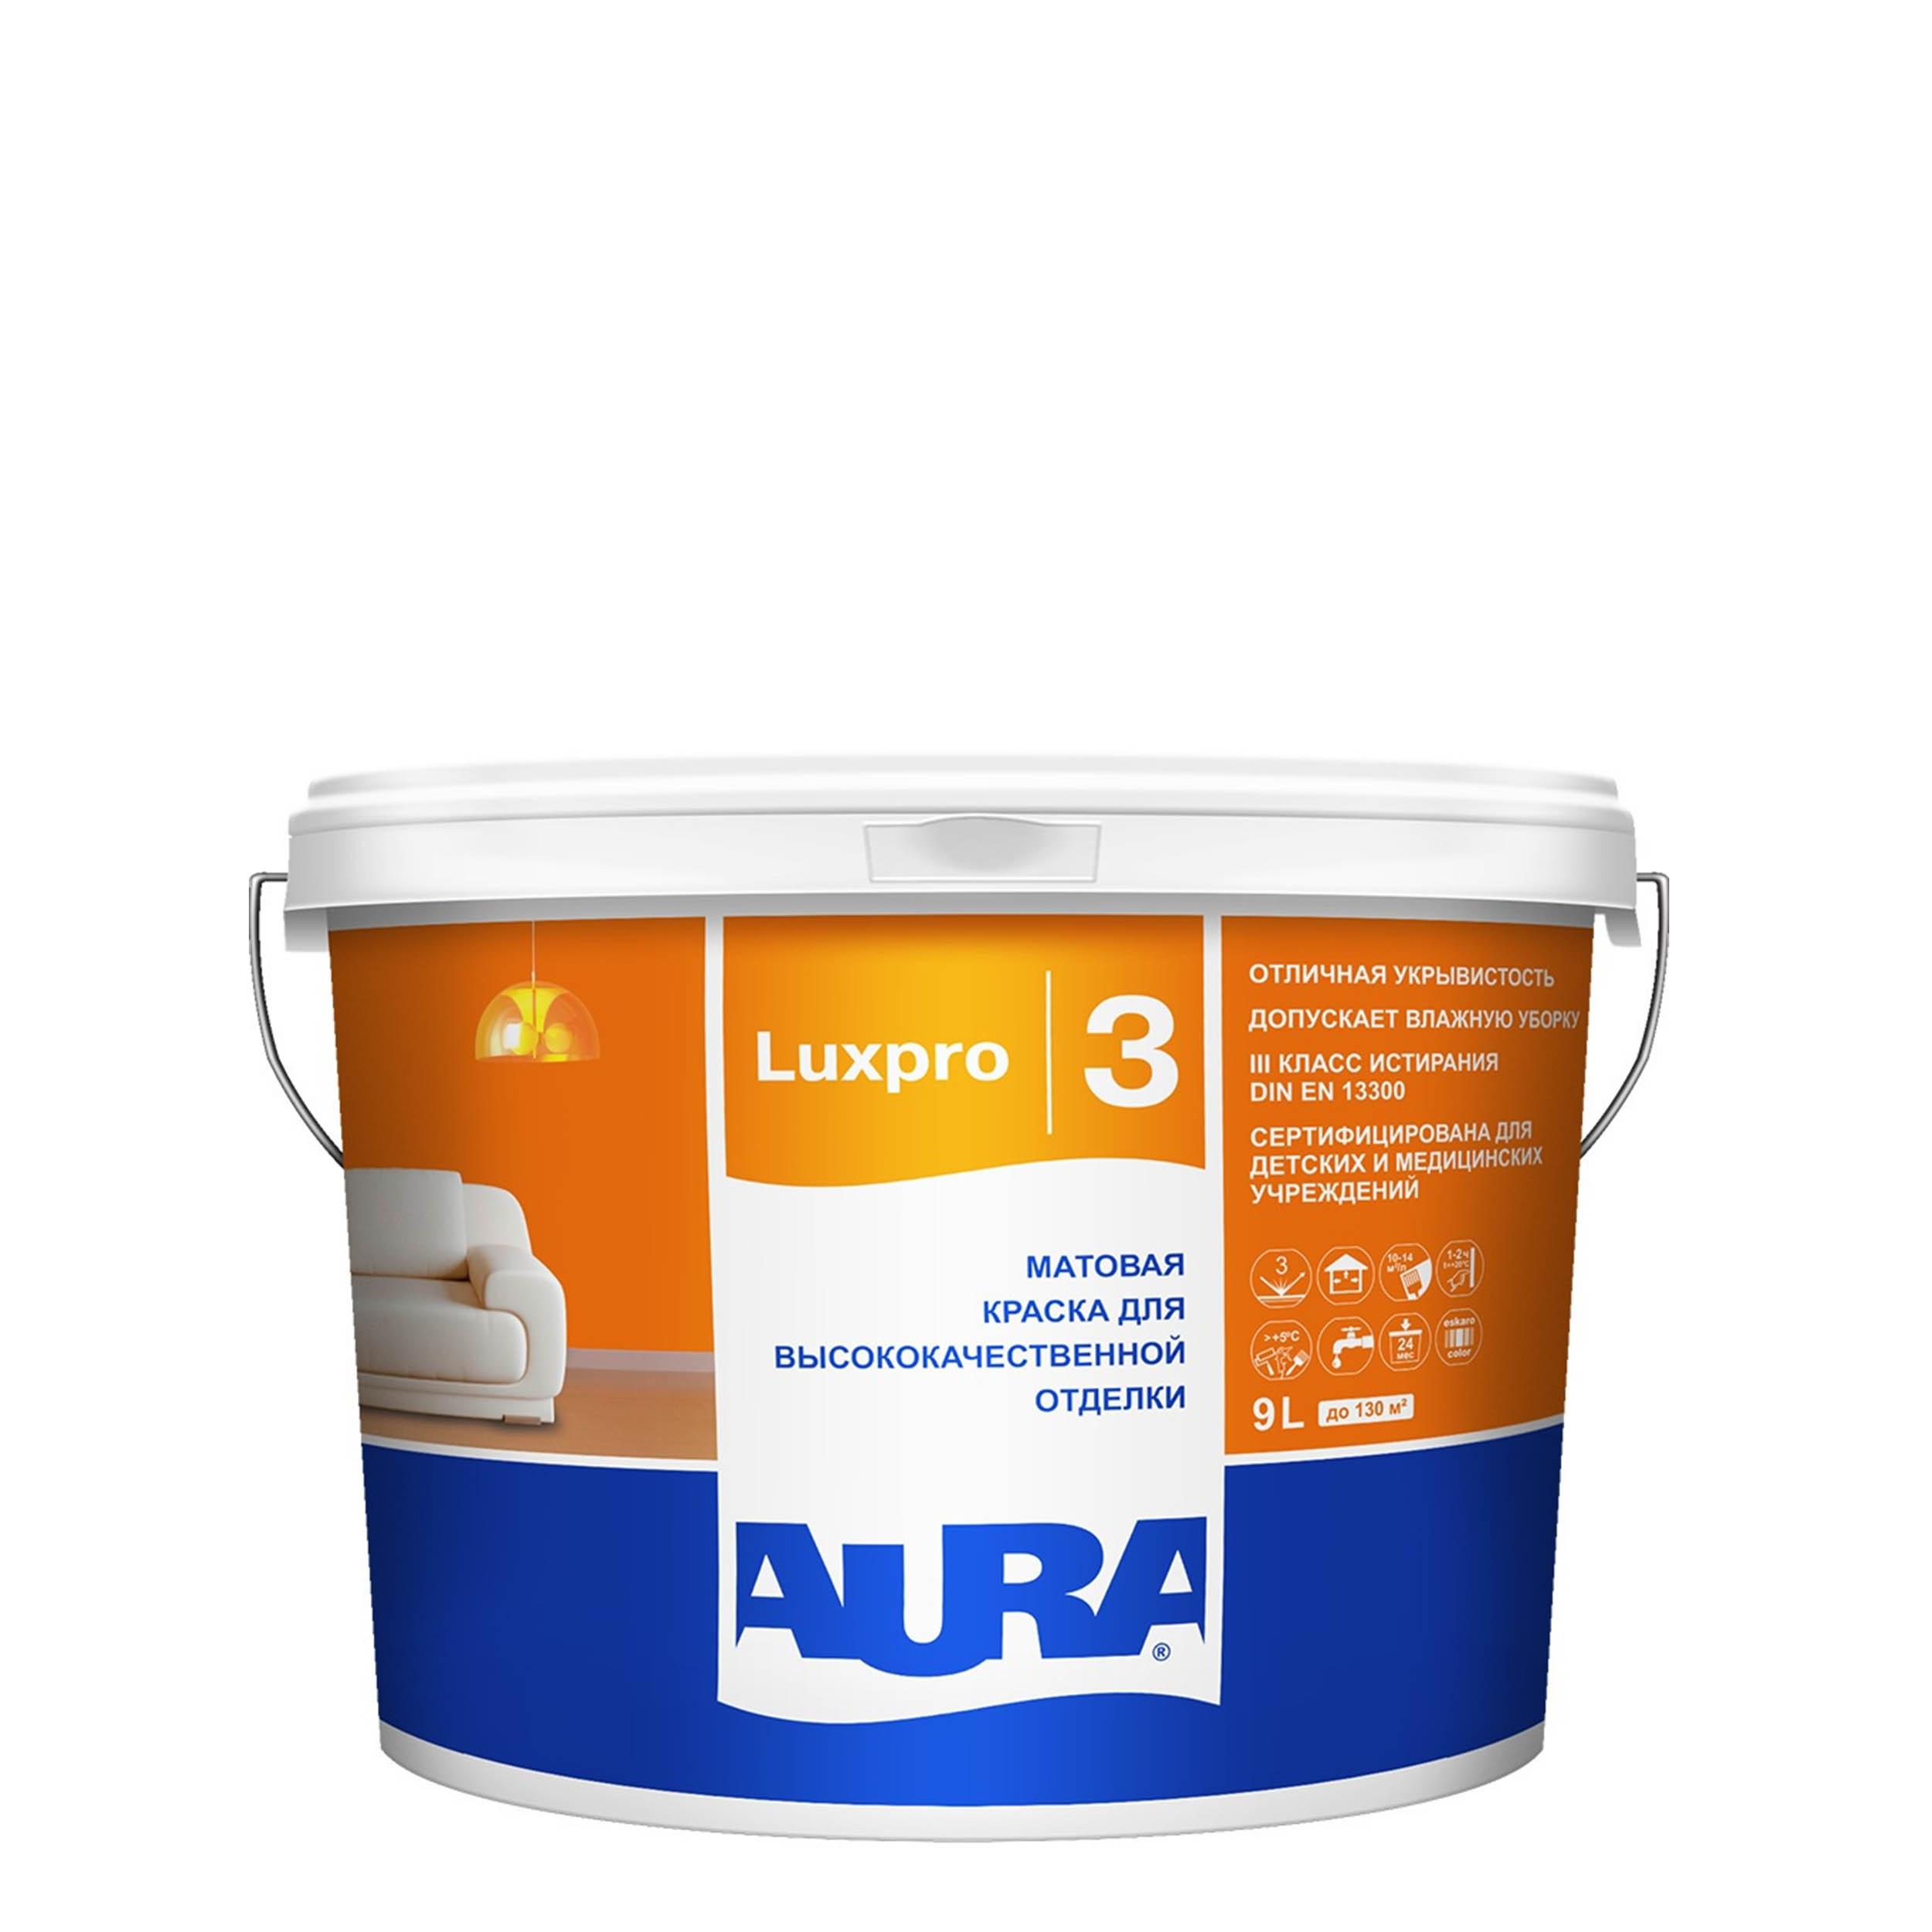 Фото 3 - Краска интерьерная, Aura LuxPRO 3, RAL 1003, 11 кг.